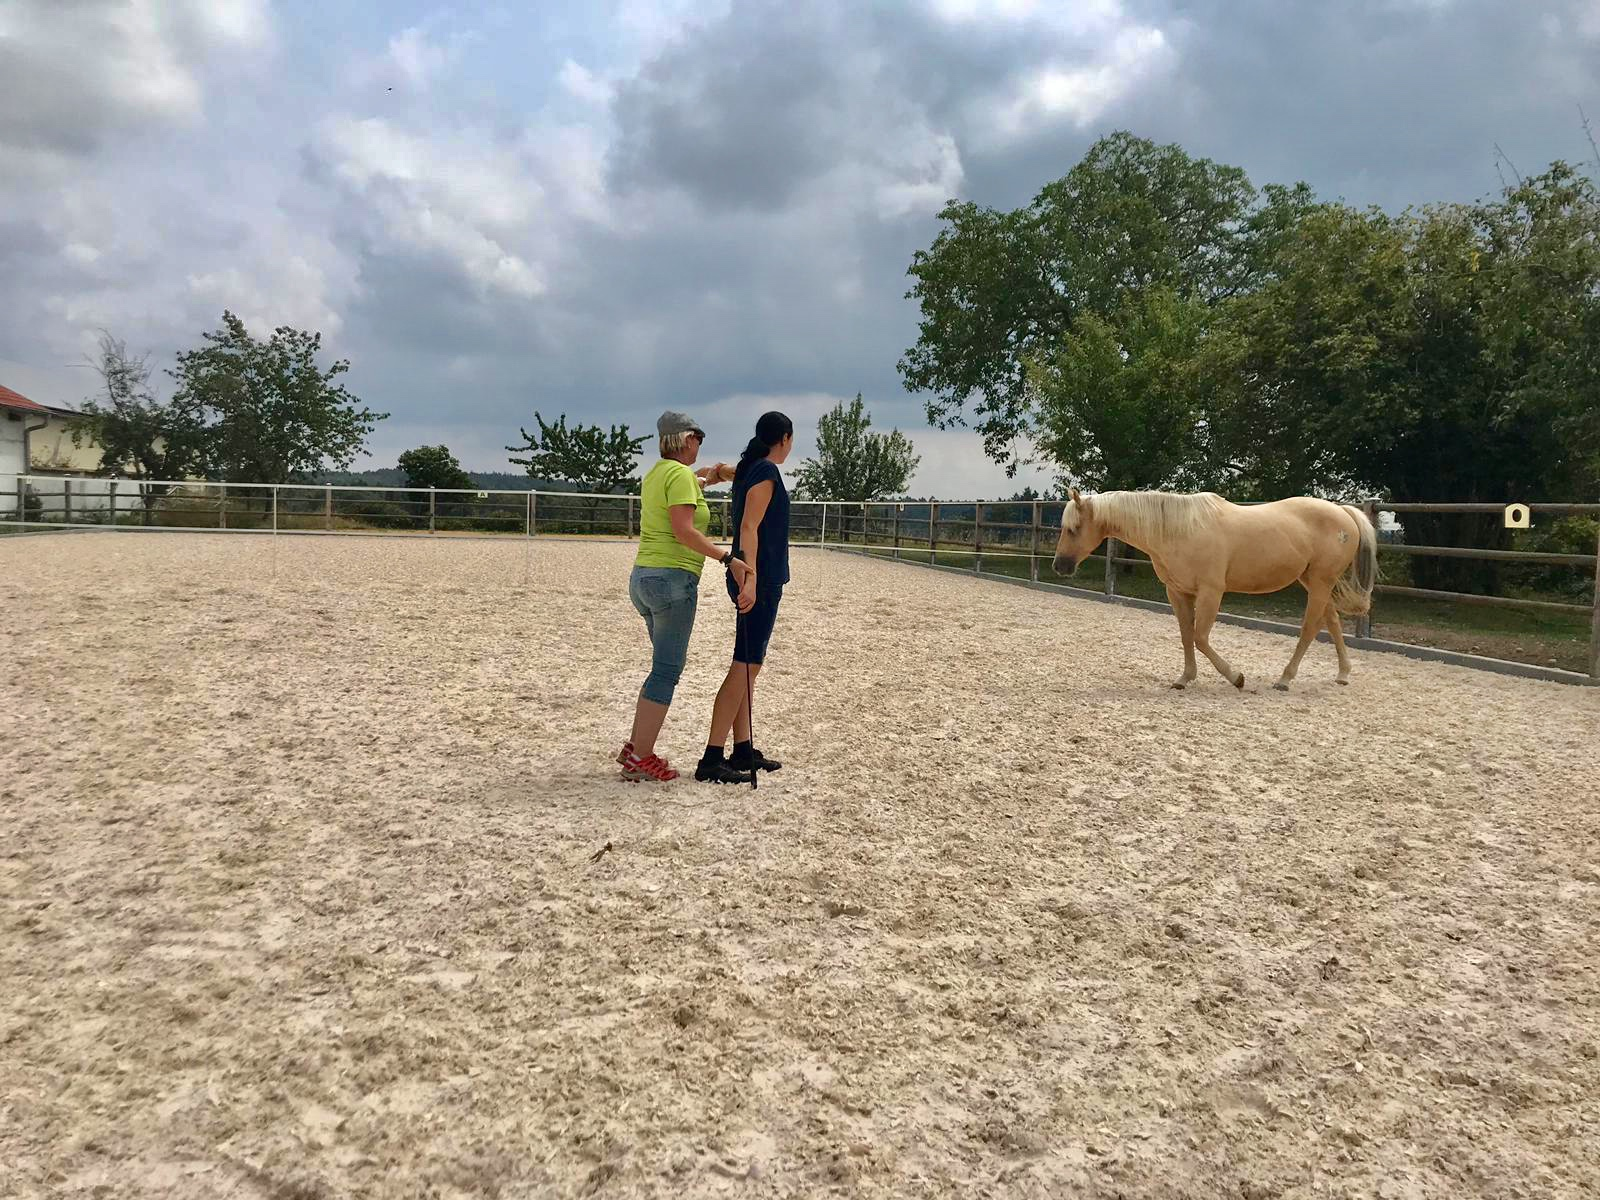 Kommunikation Pferd Mensch